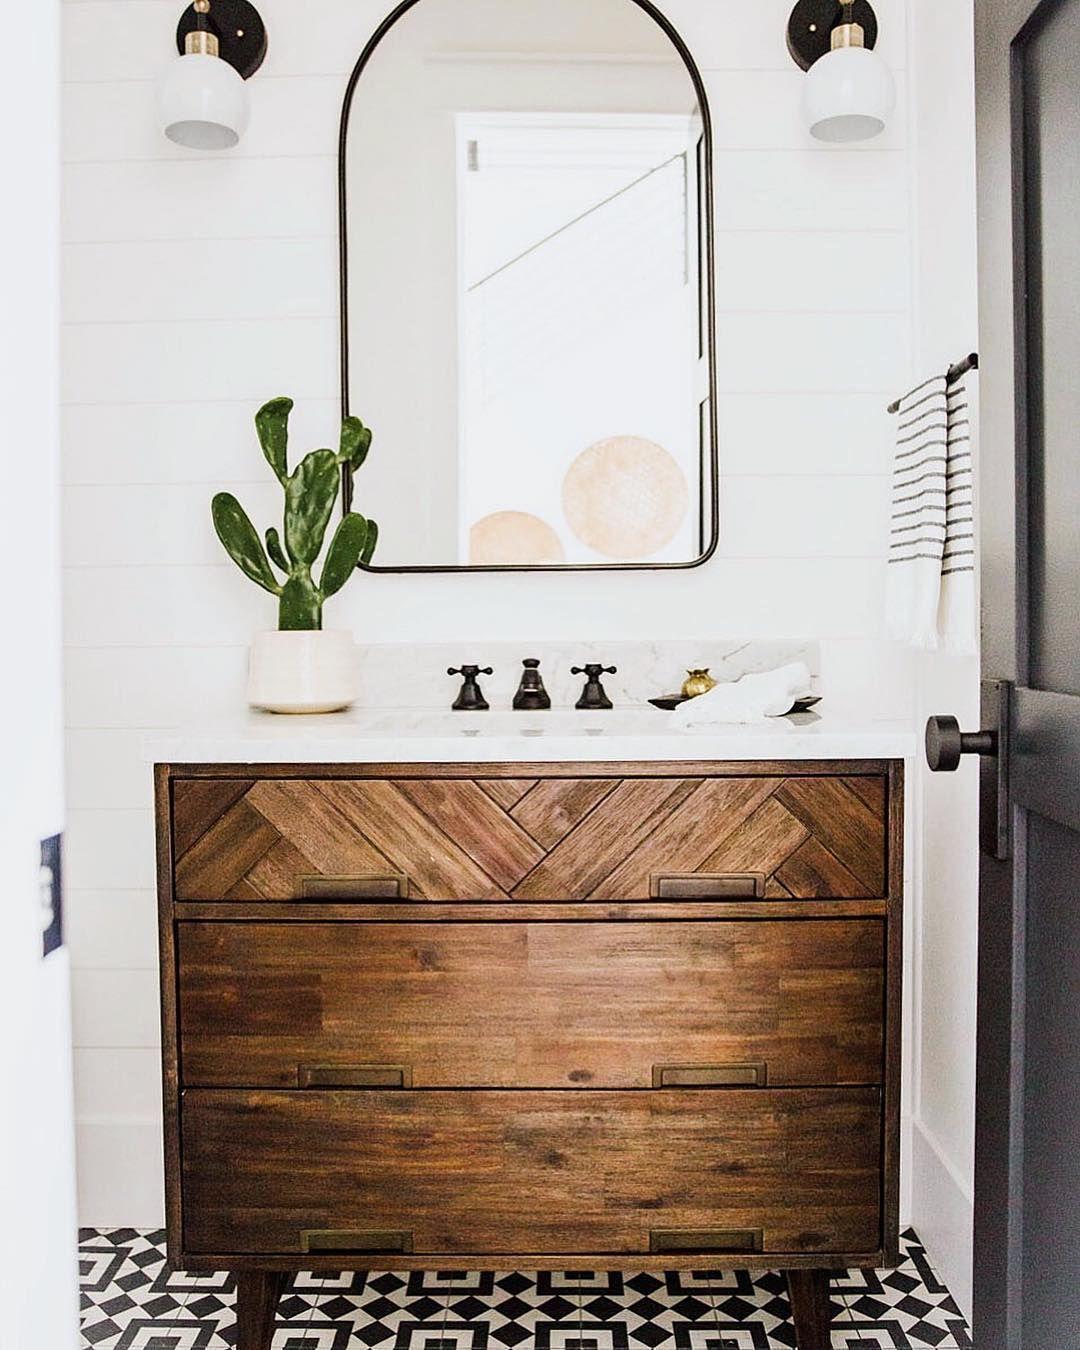 Dark Wood Stain Throughout Love The Mirror For The Bathroom And The Light Fixtures Bathroom Decor Home Decor Bathroom Design